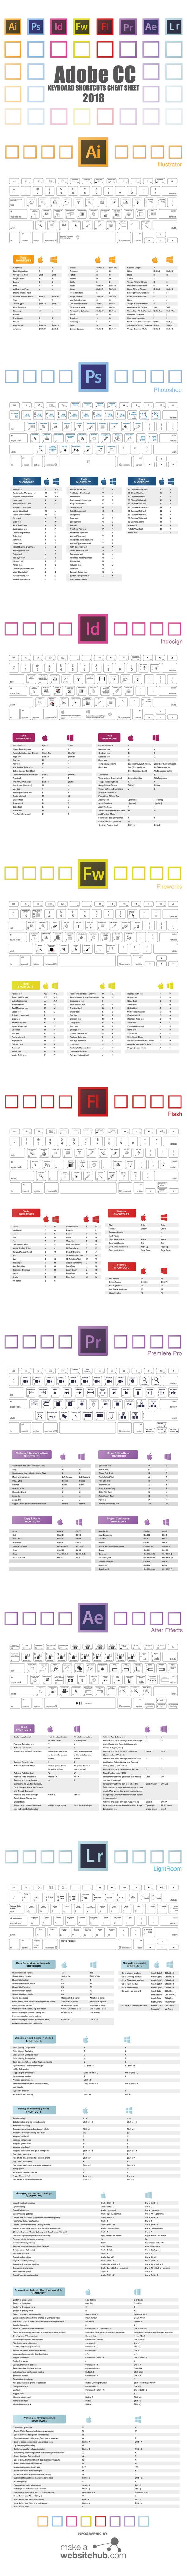 2017-Adobe-CC-Keyboard-ShortCuts-Cheat-Sheet